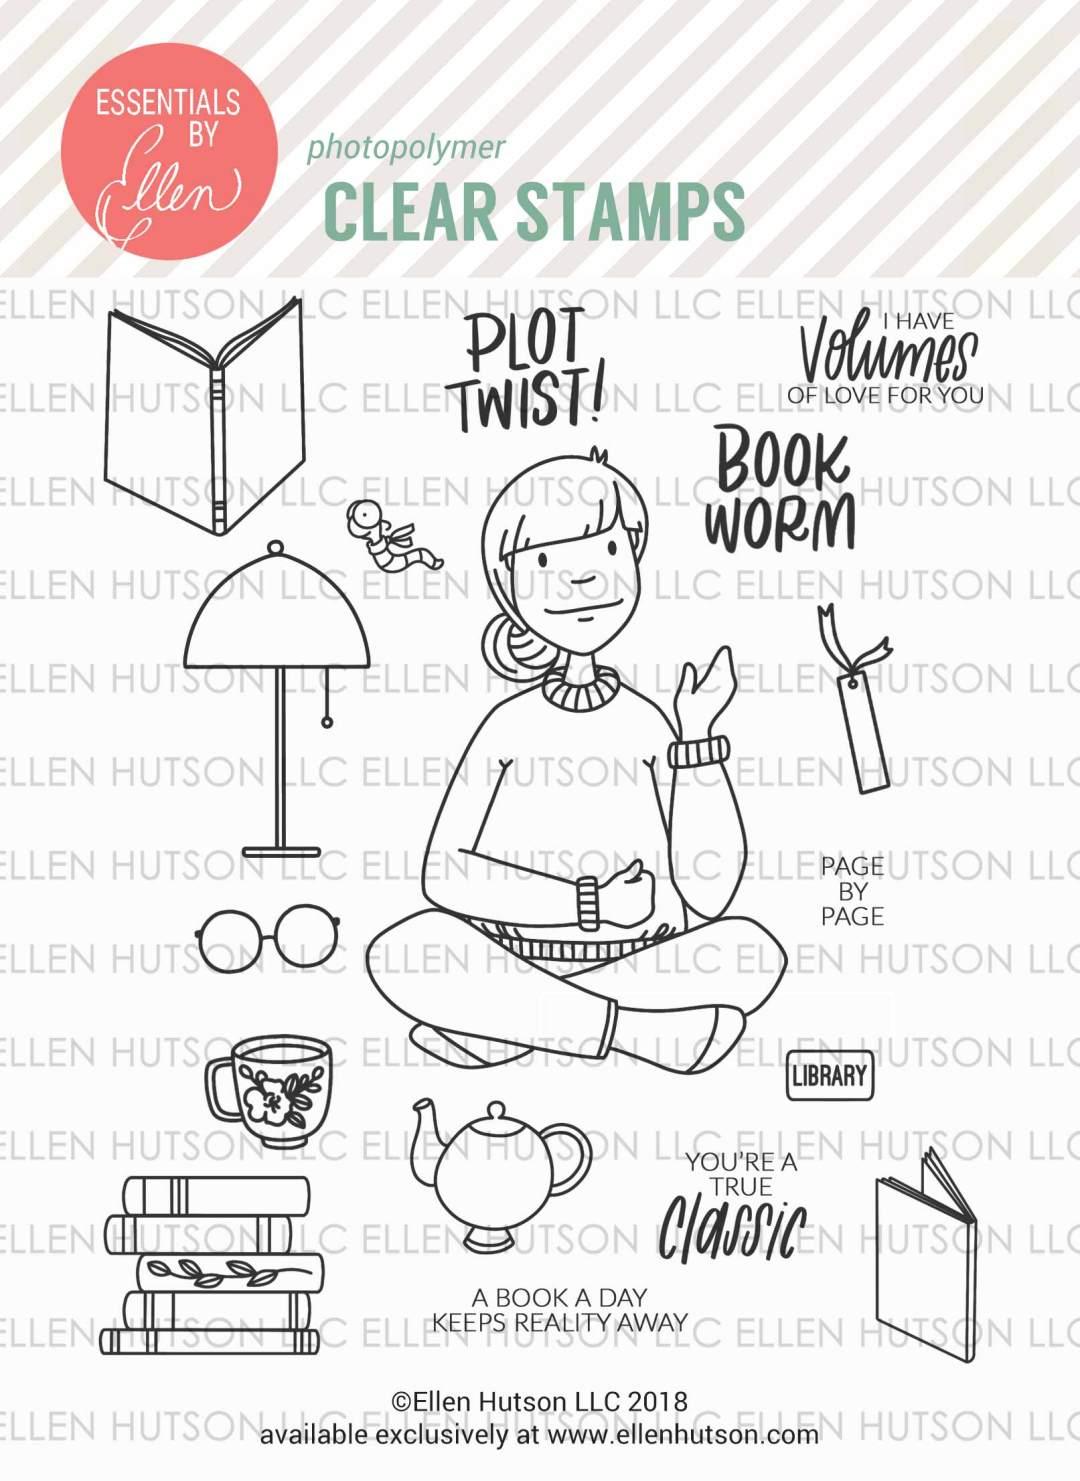 Essentials by Ellen Bookworm Lady stamps